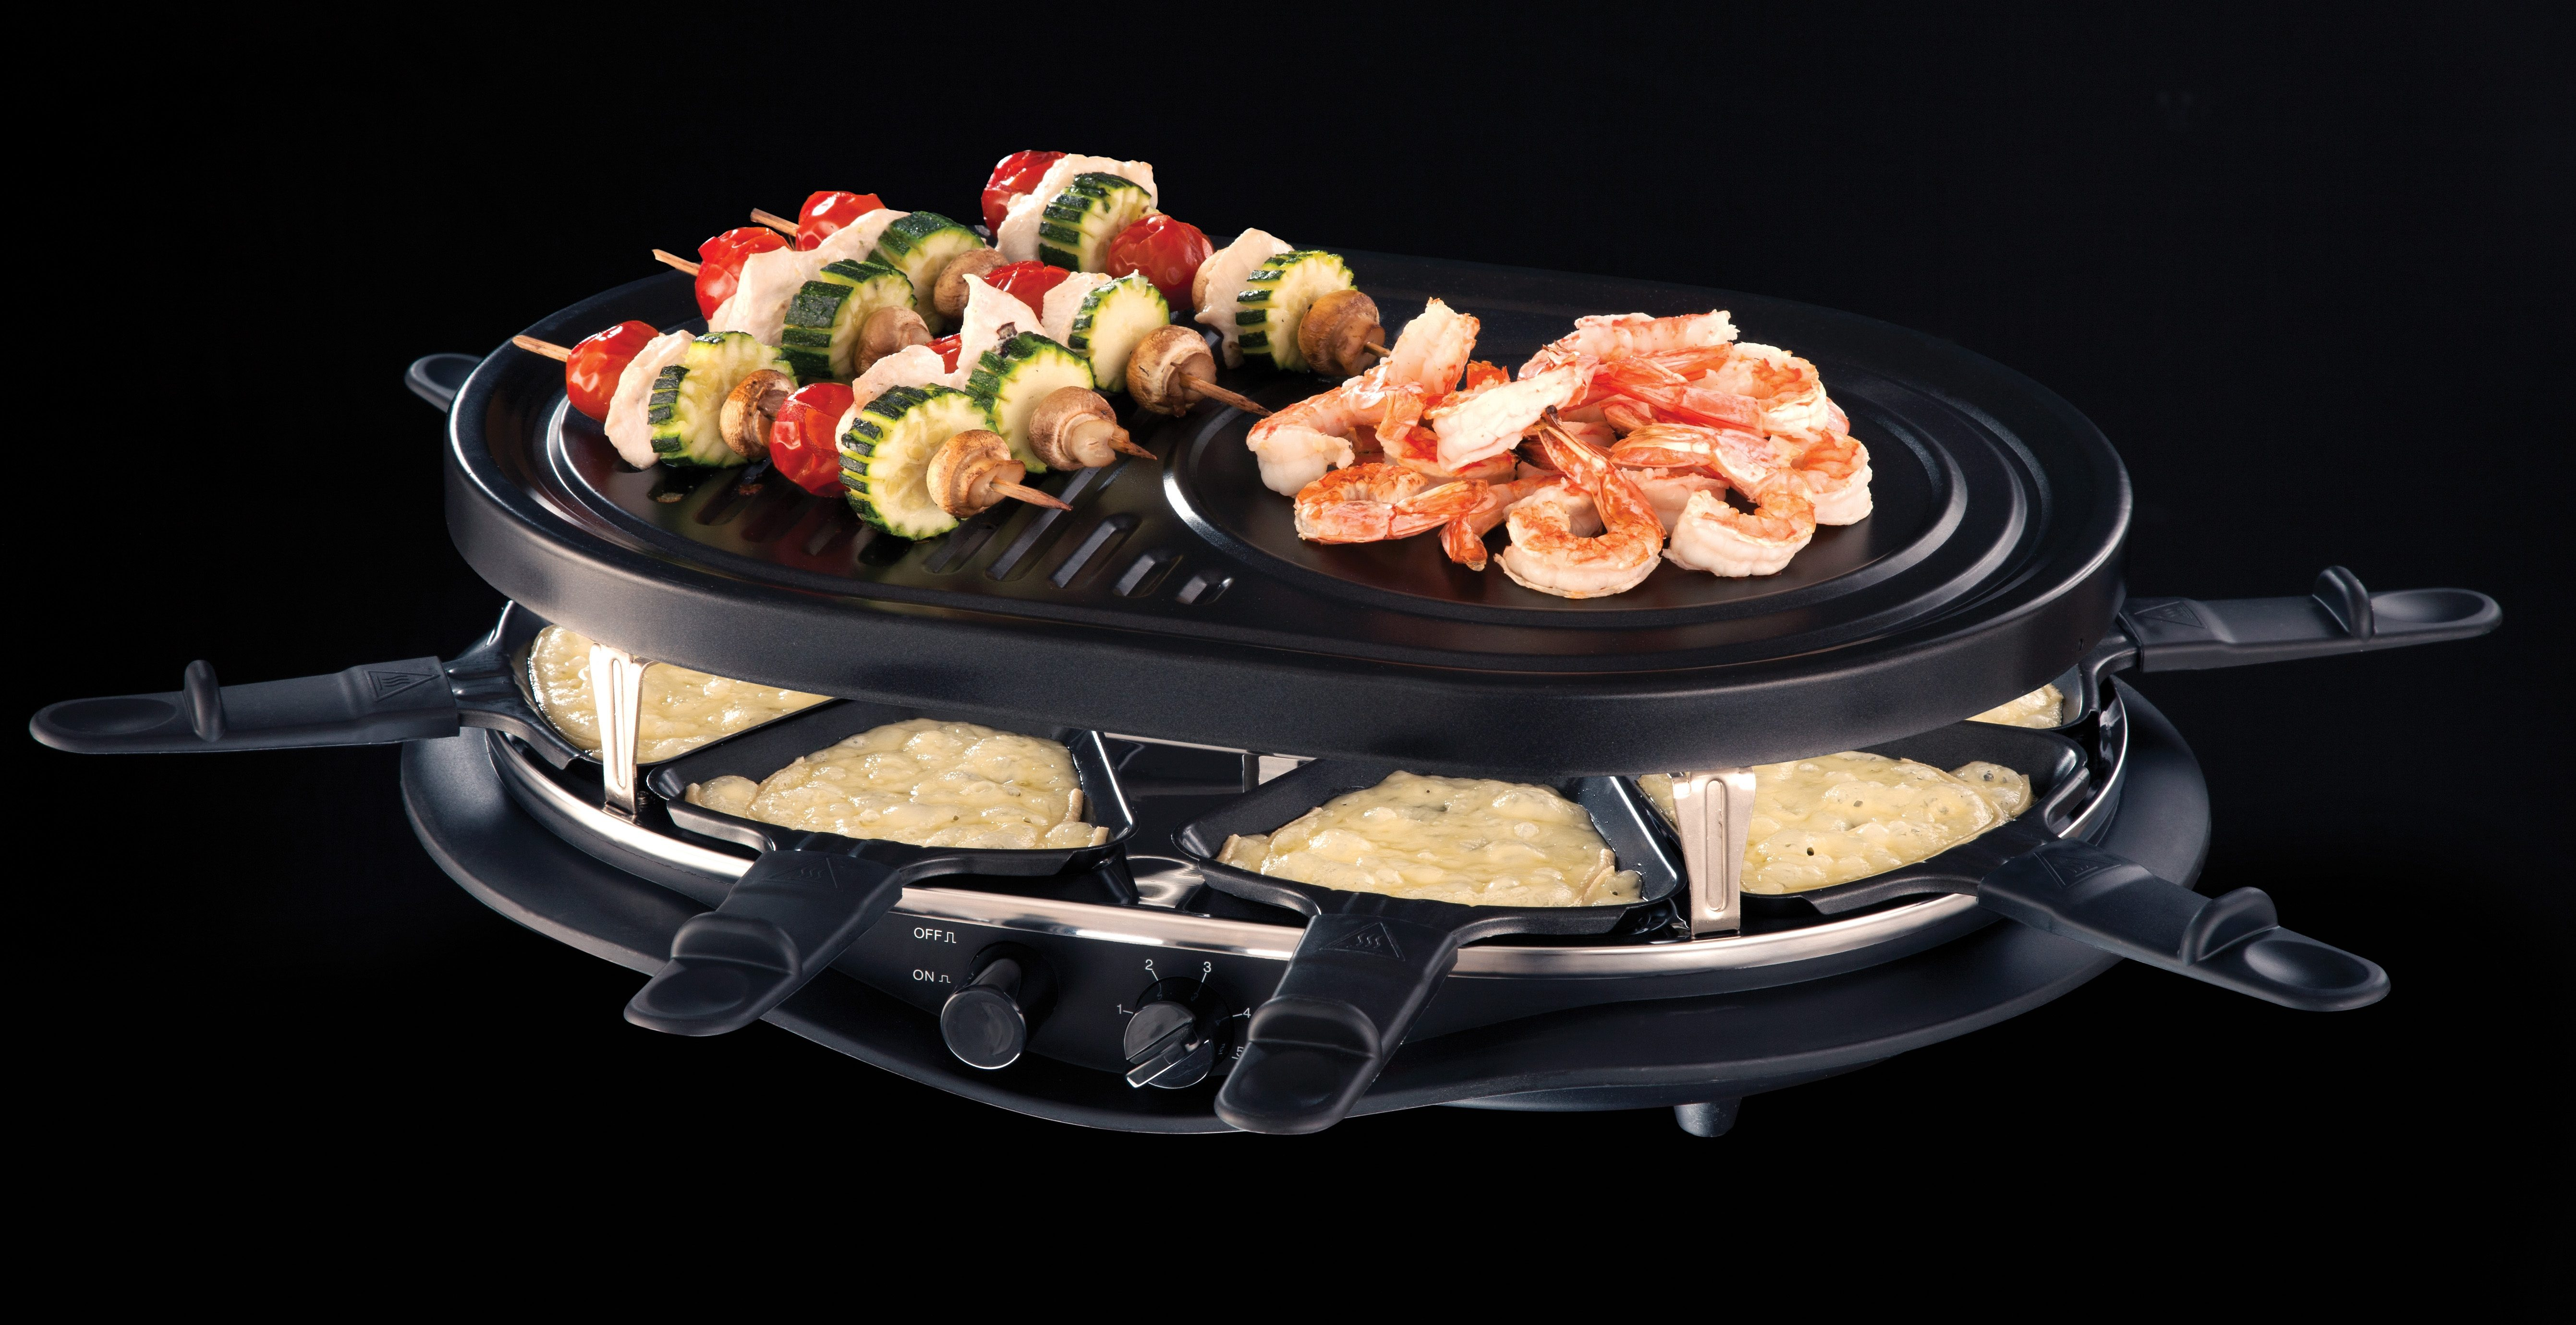 RUSSELL HOBBS Raclette Multi-Raclette Fiesta 21000-56, 6 Raclettepfännchen, 1200 W